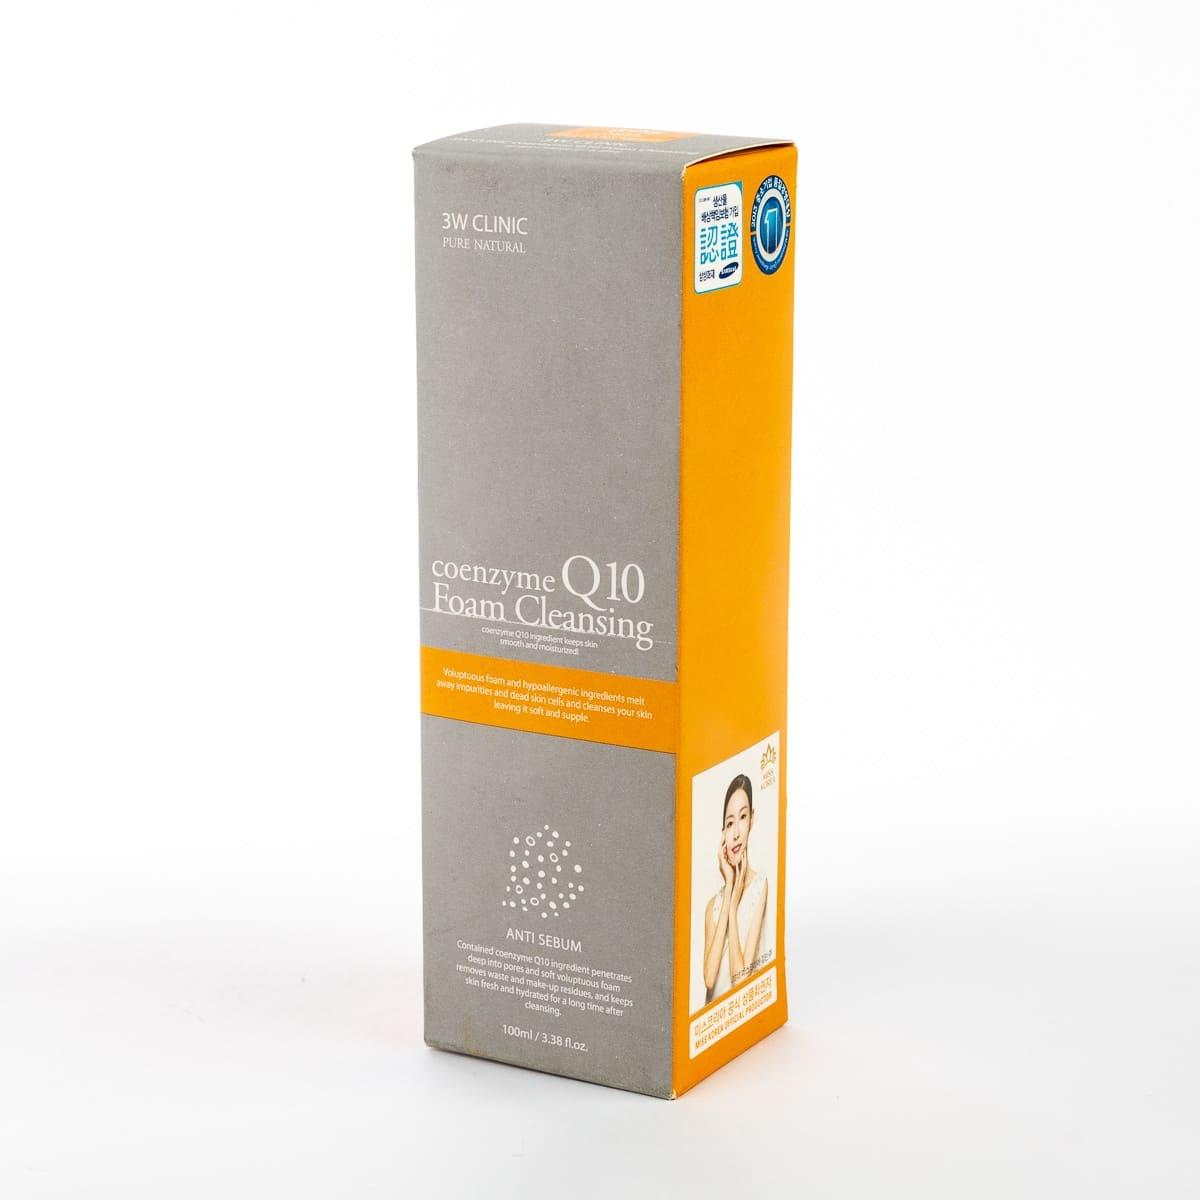 Очищающая пенка для лица с коэнзимом Q10 - 3W Clinic Coenzyme Q10 Foam Cleansing